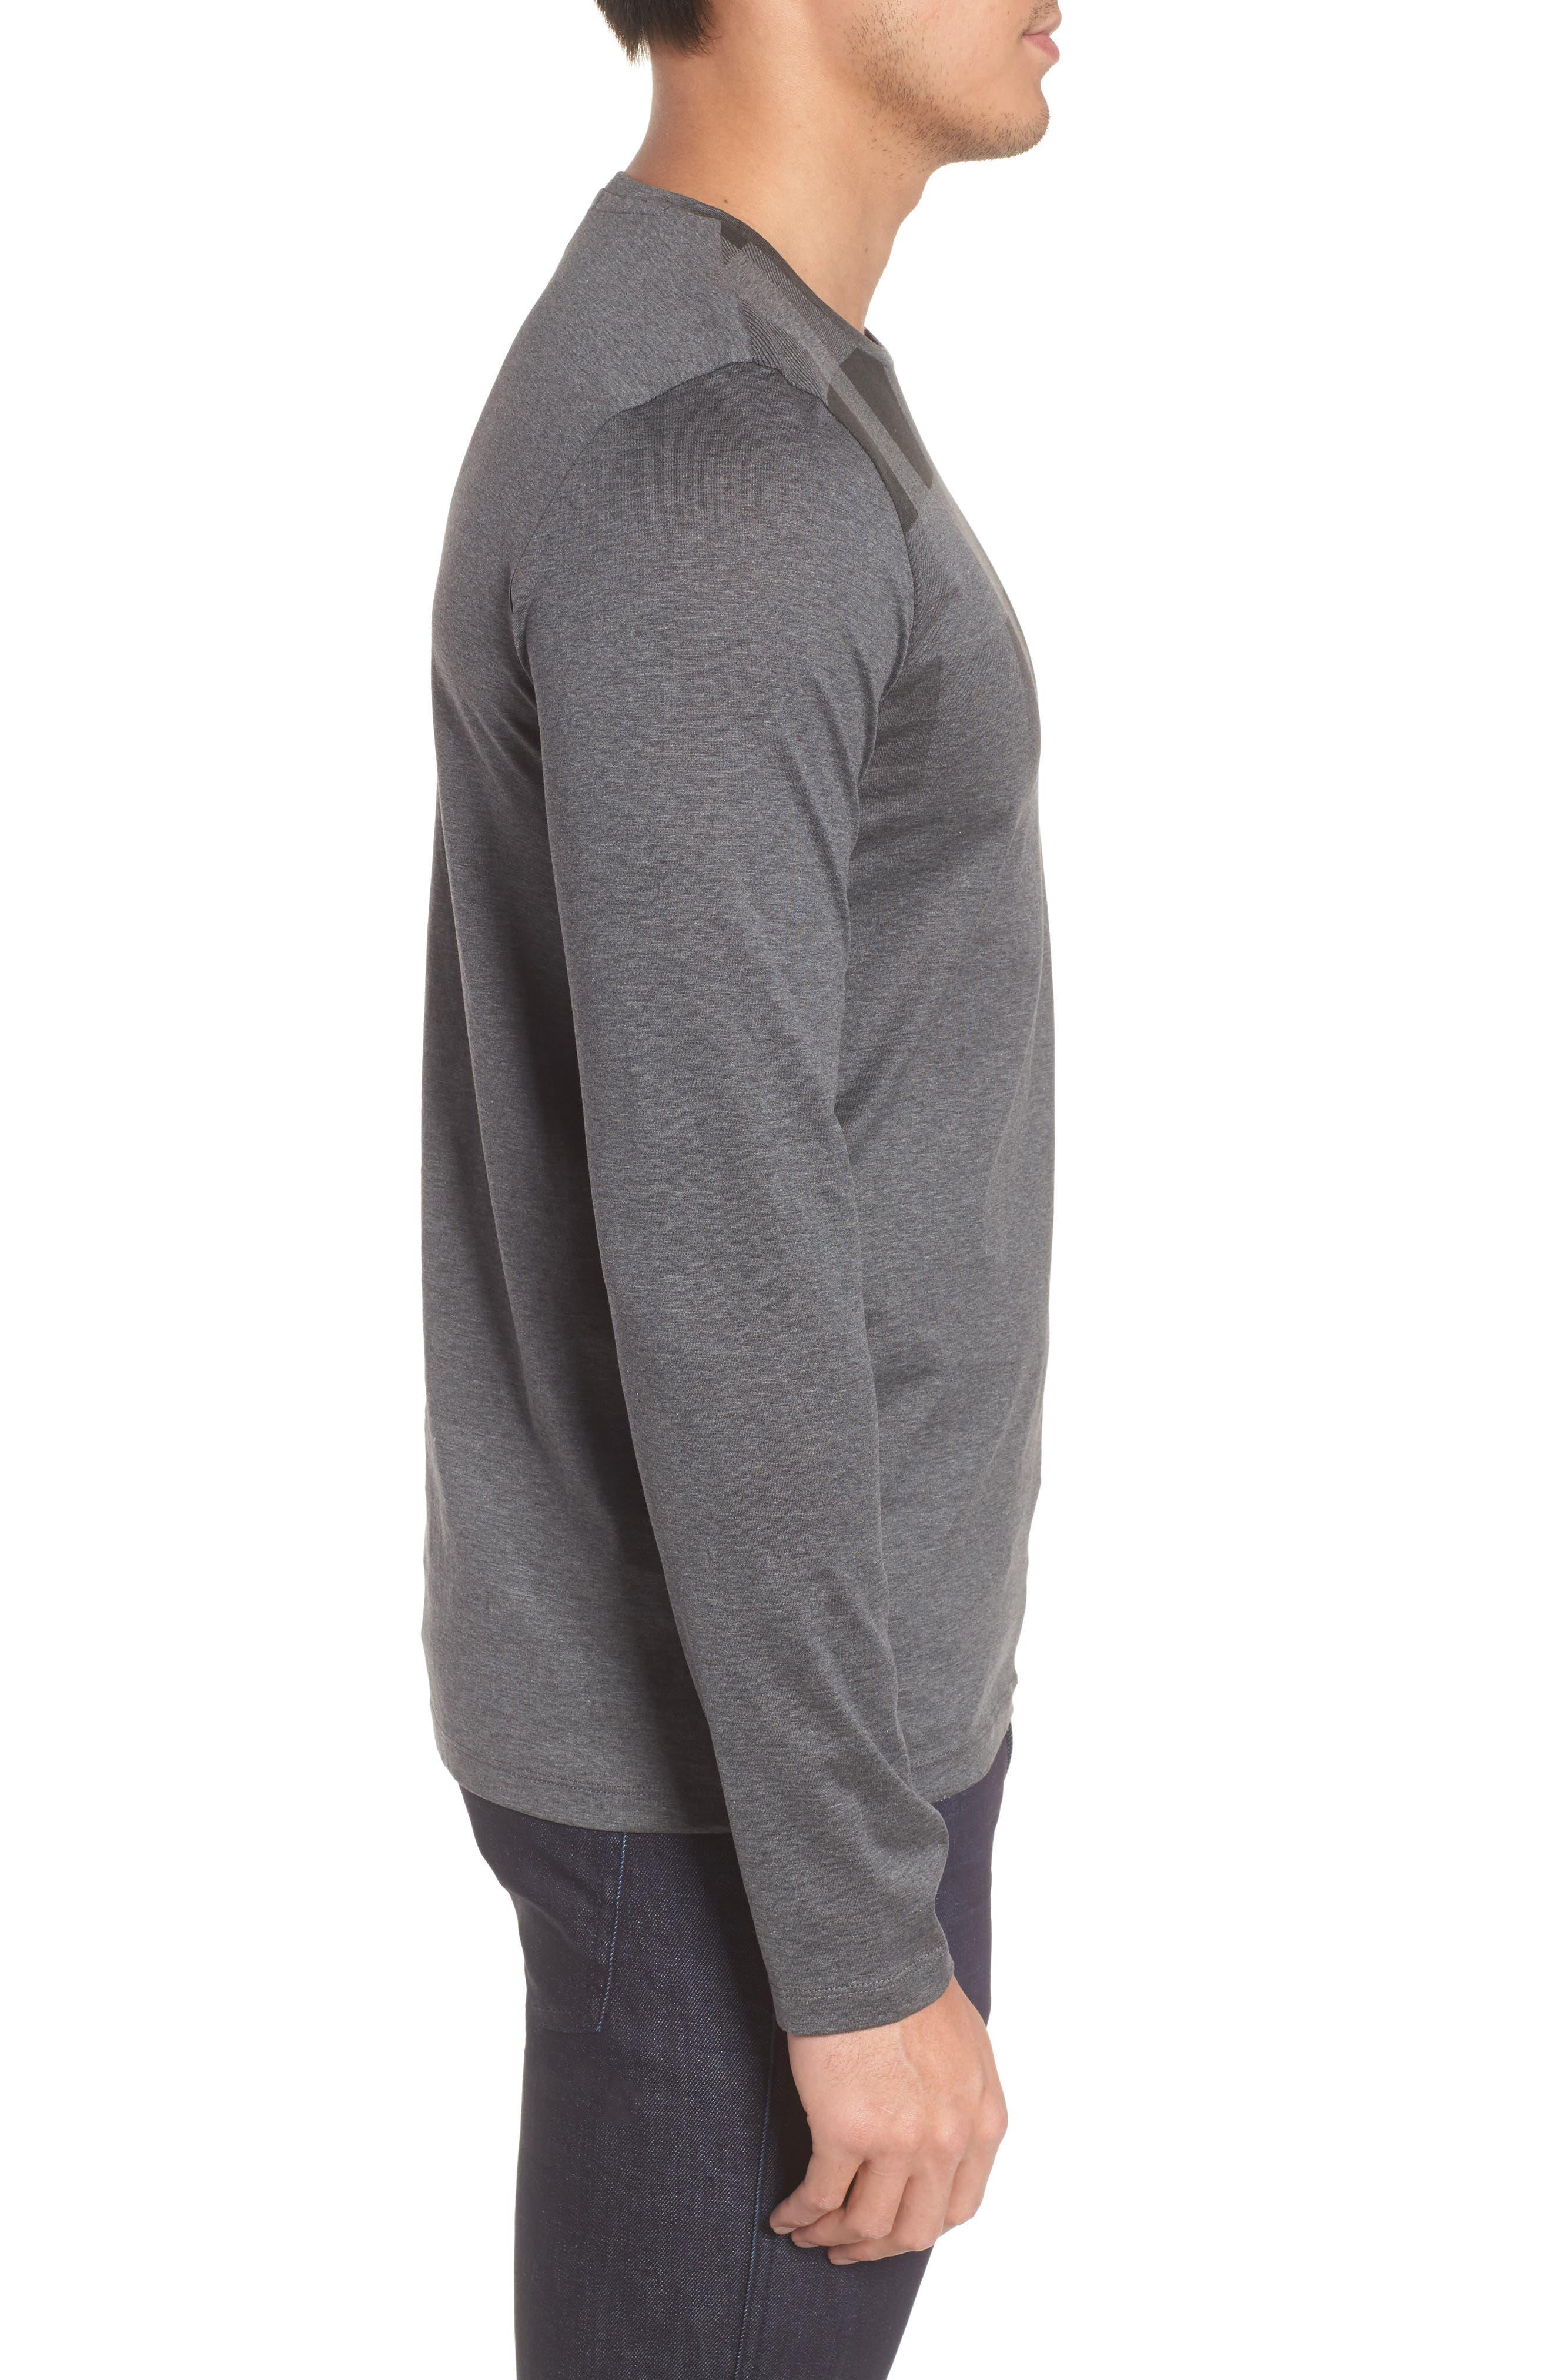 Tenison Slim Fit Ombre Check Long Sleeve T-shirt,                             Alternate thumbnail 3, color,                             030